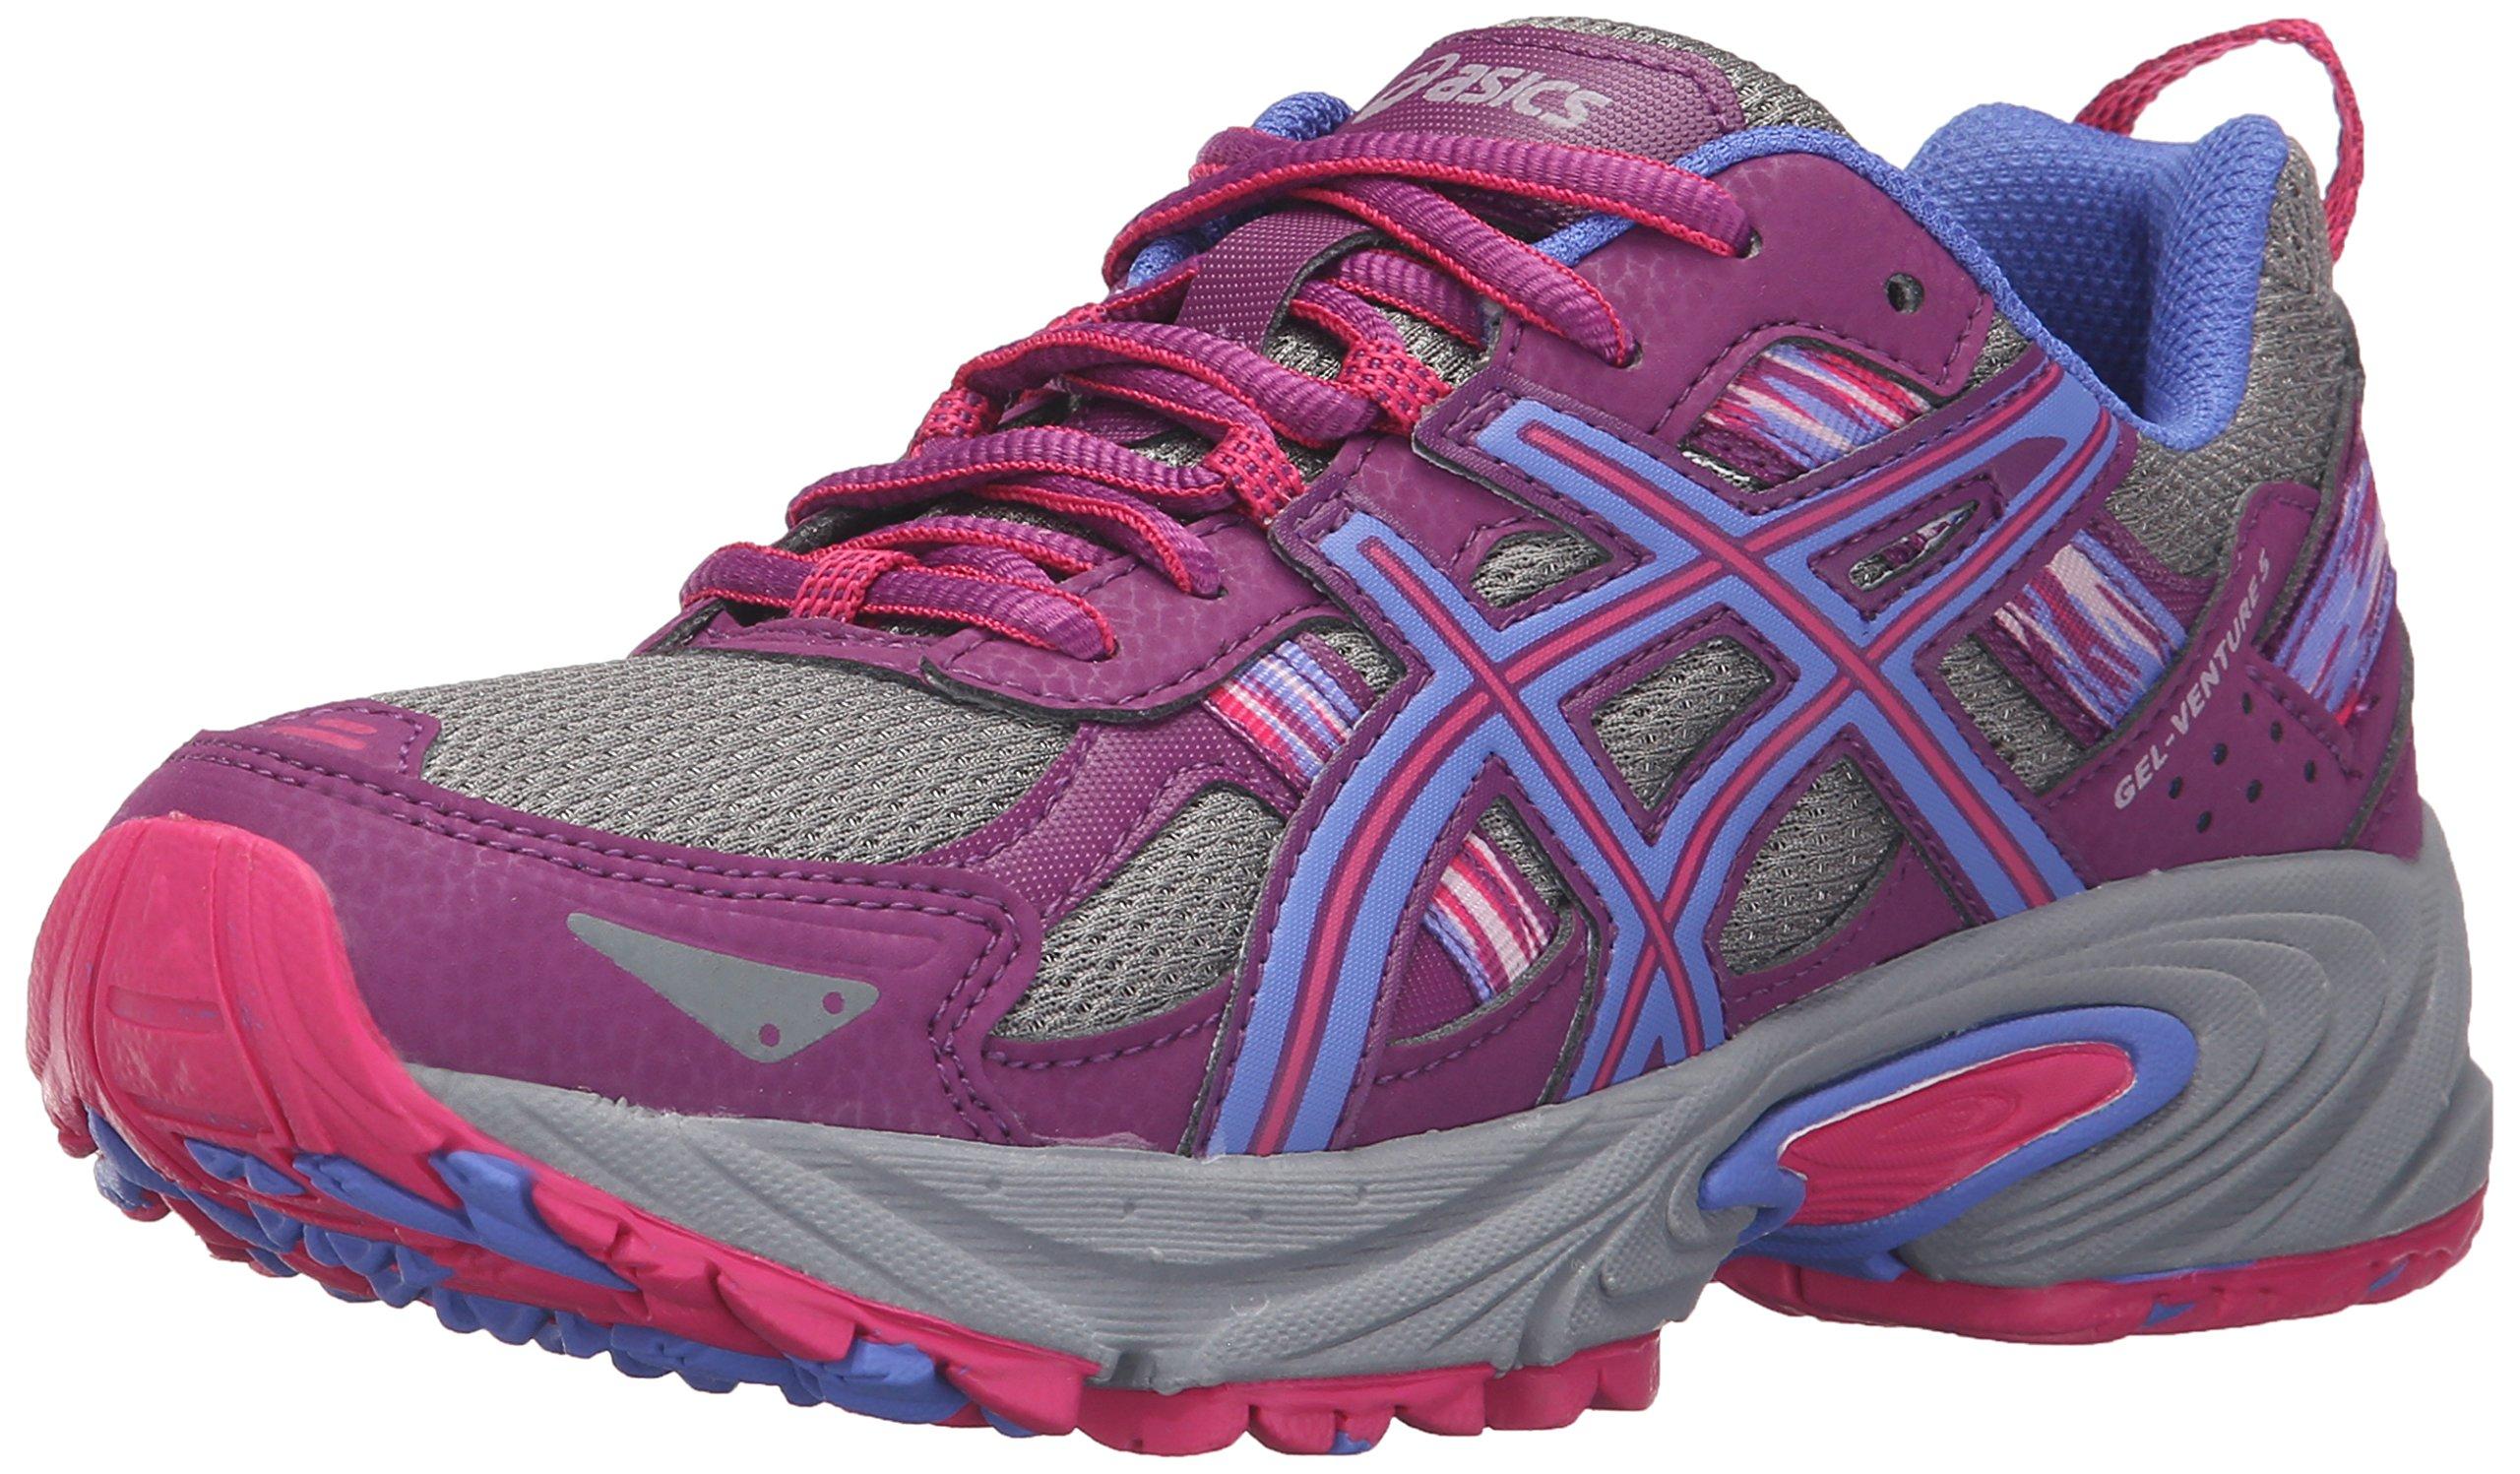 ASICS Women's Gel-Venture 5 Trail Runner, Phlox/Sport Pink/Aluminum, 8 M US